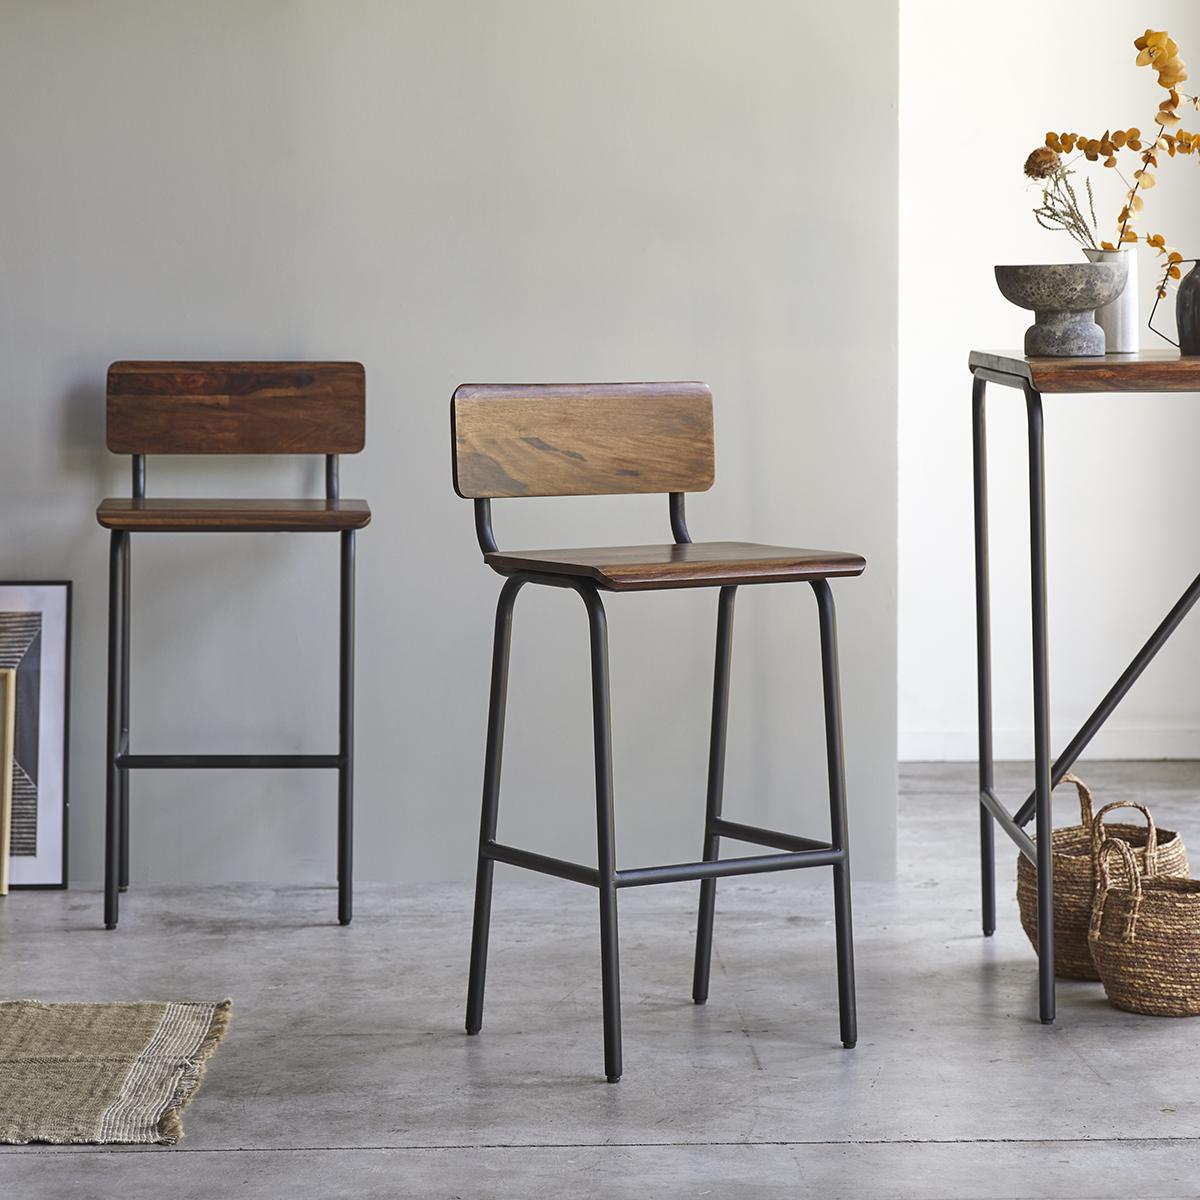 Talia solid sheesham and metal Bar Chair